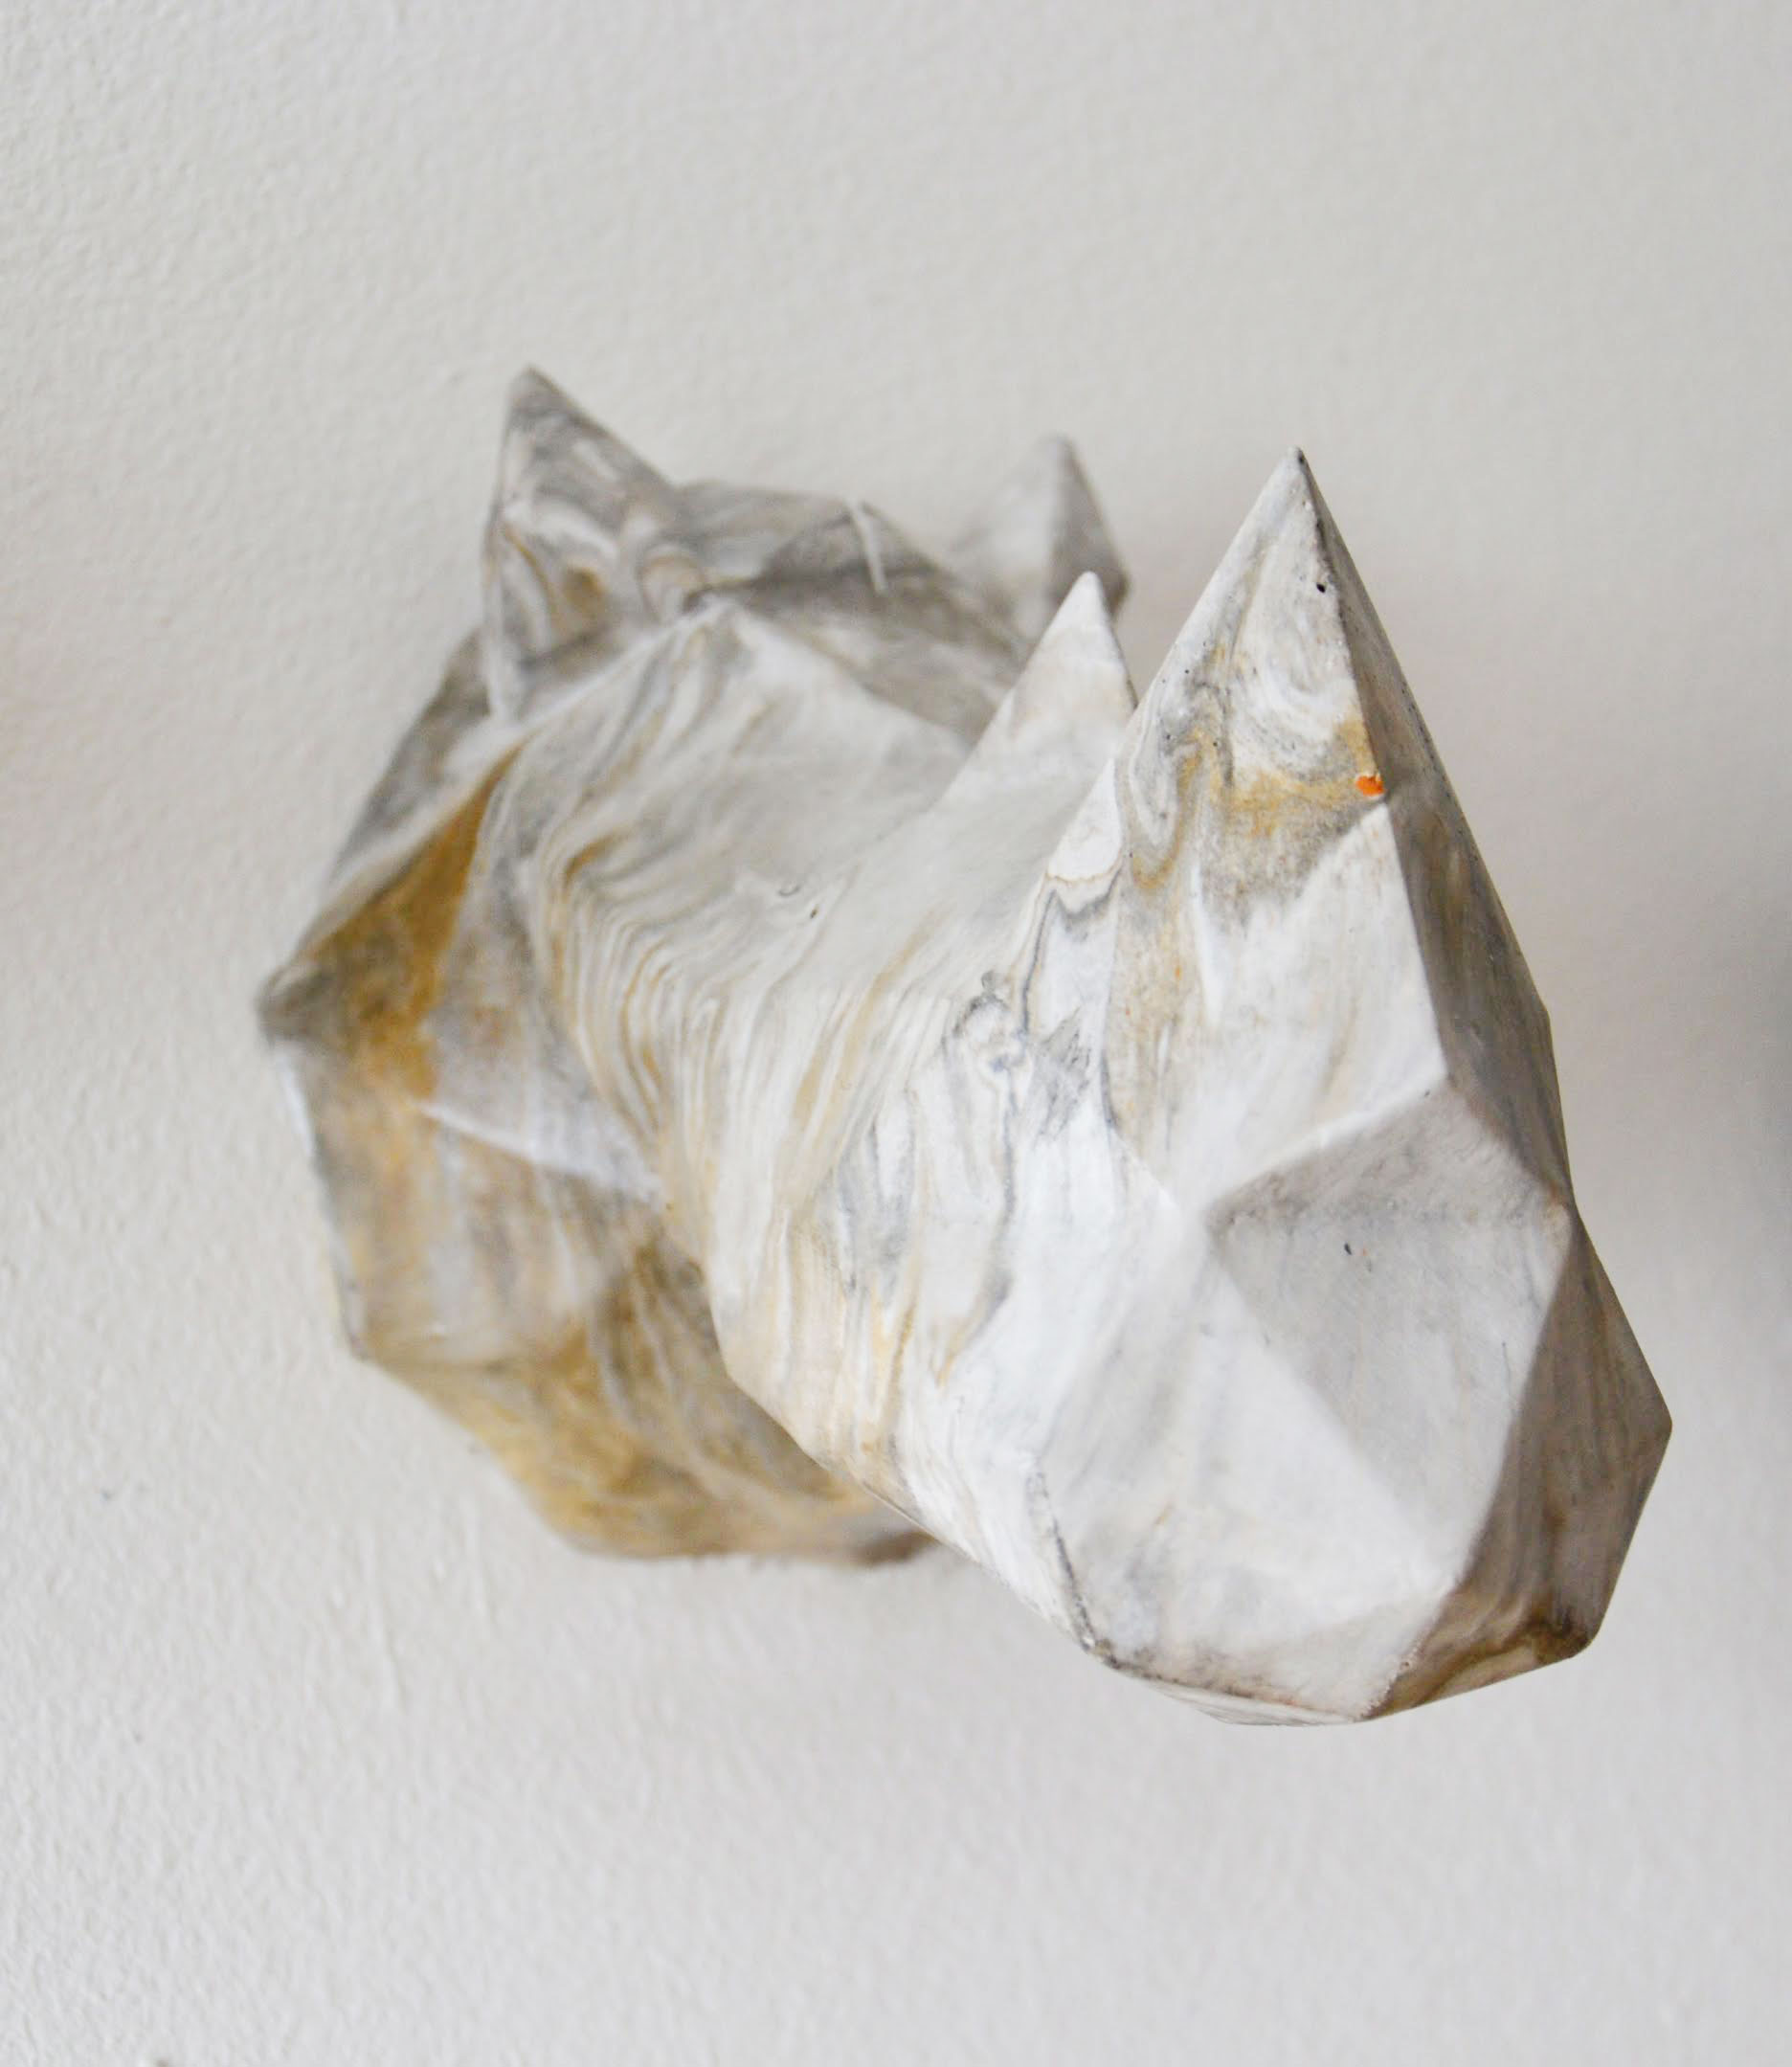 miss-cloudy-thomas-pagliuca-atelier-concrete-hunting-trophy-rhinoceros-6.jpg